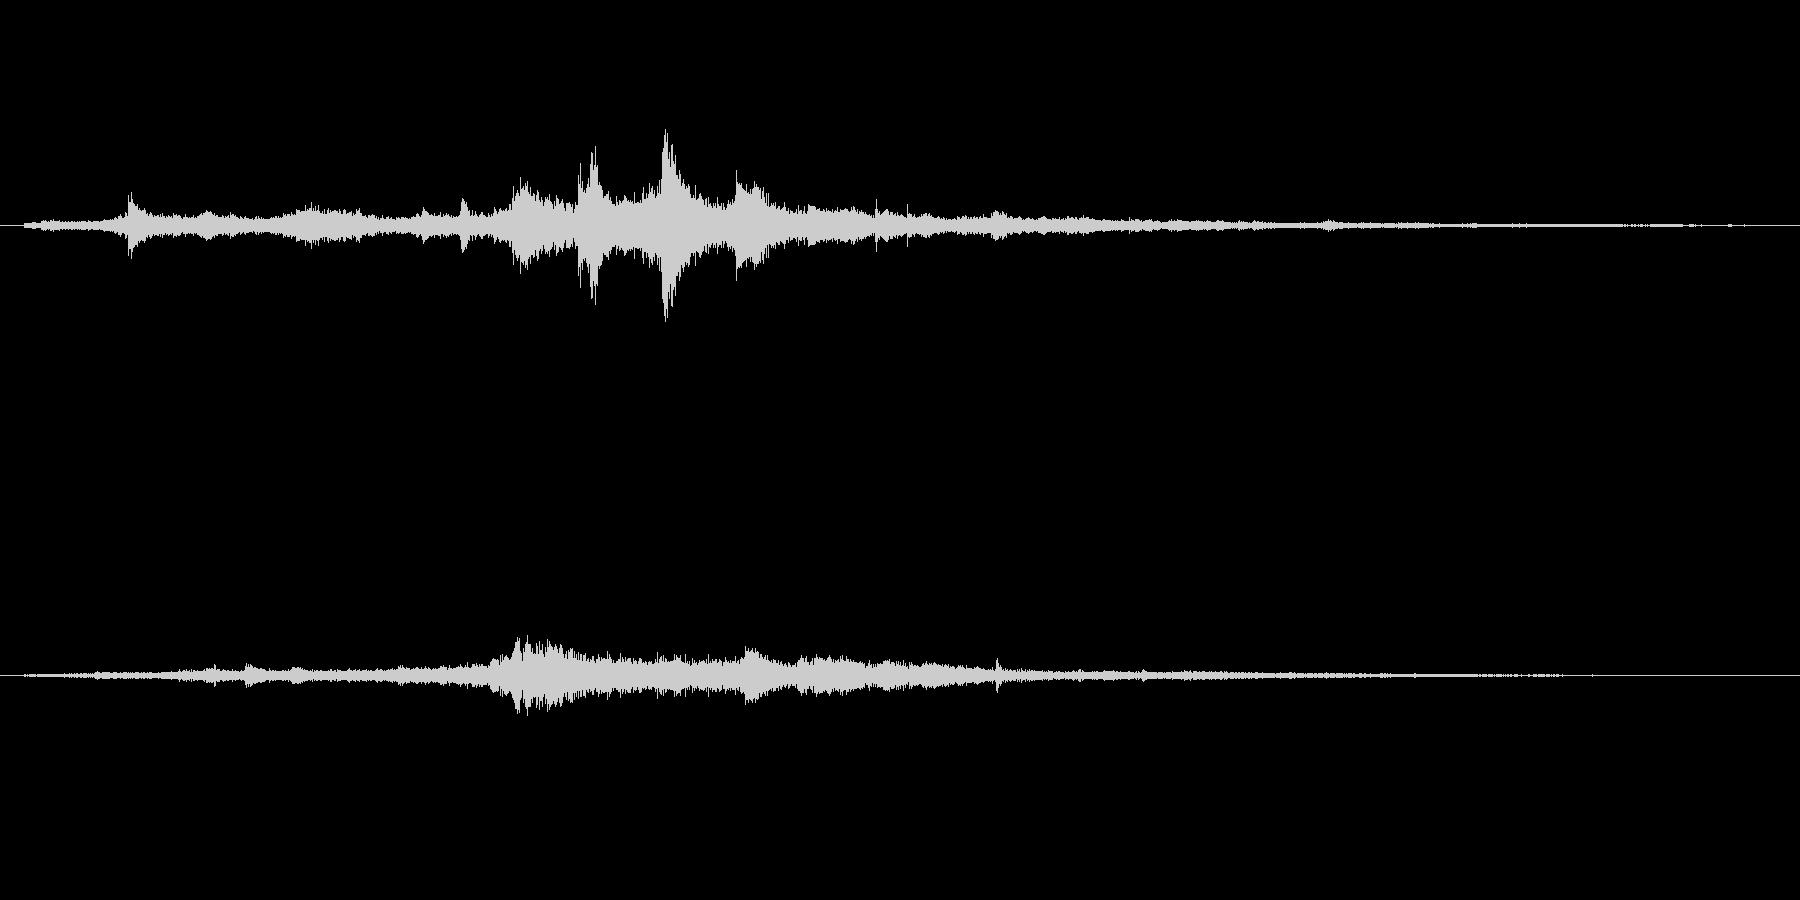 【SE 効果音】奇妙な音11の未再生の波形